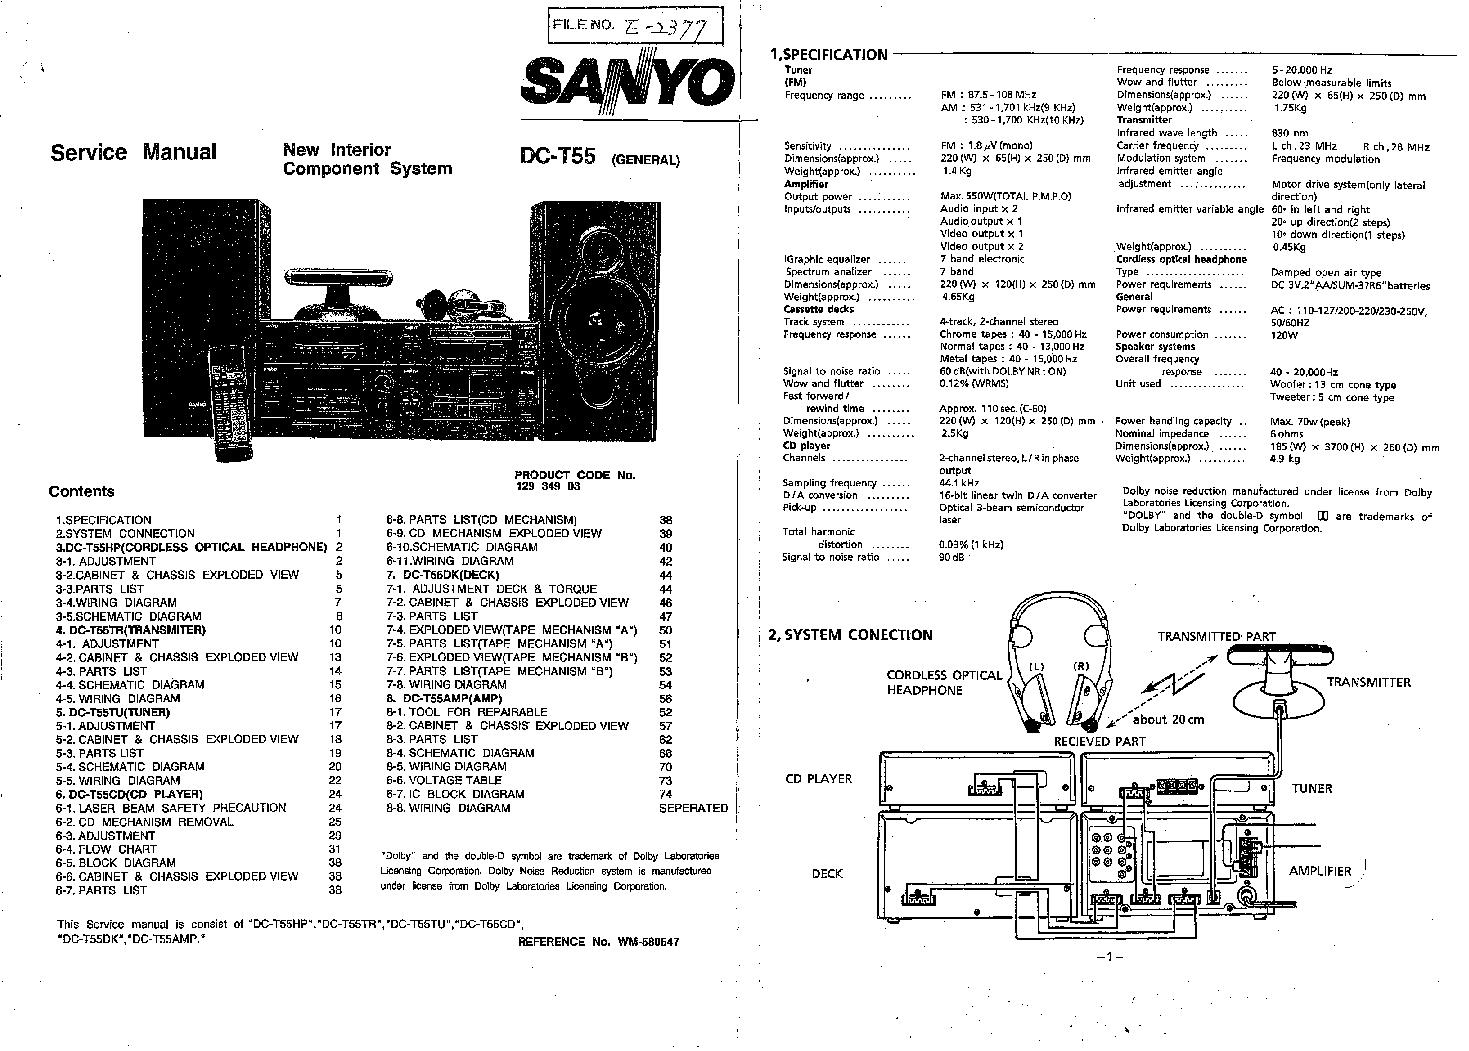 Sanyo Dc T55 Sm Service Manual Download Schematics